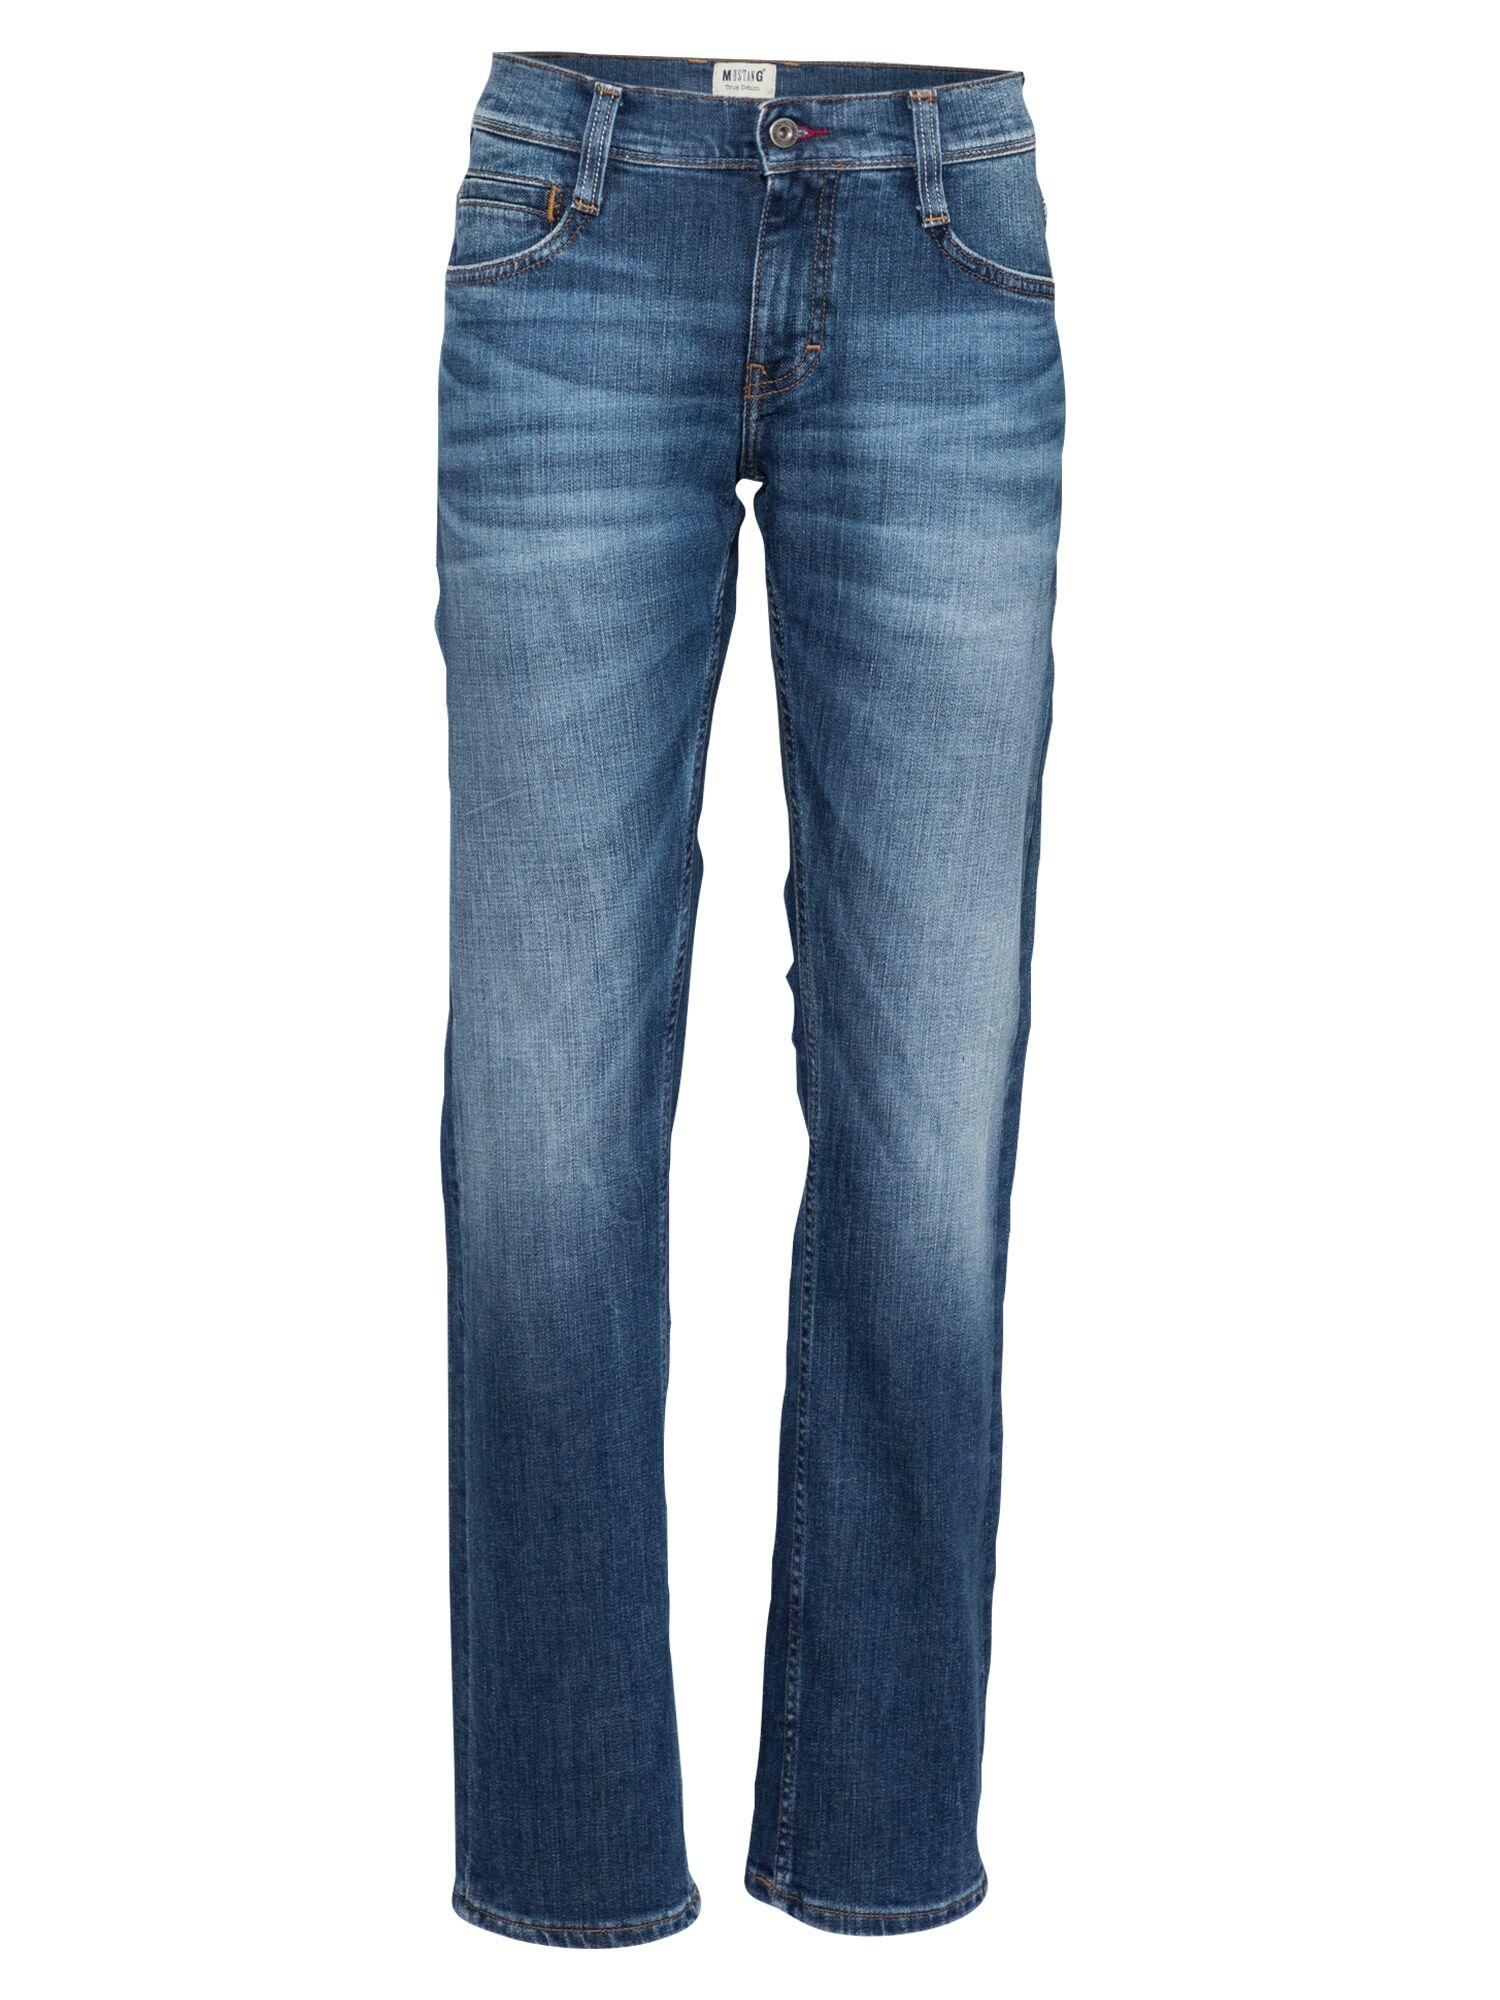 MUSTANG Jean 'Oregon '  - Bleu - Taille: 34 - male